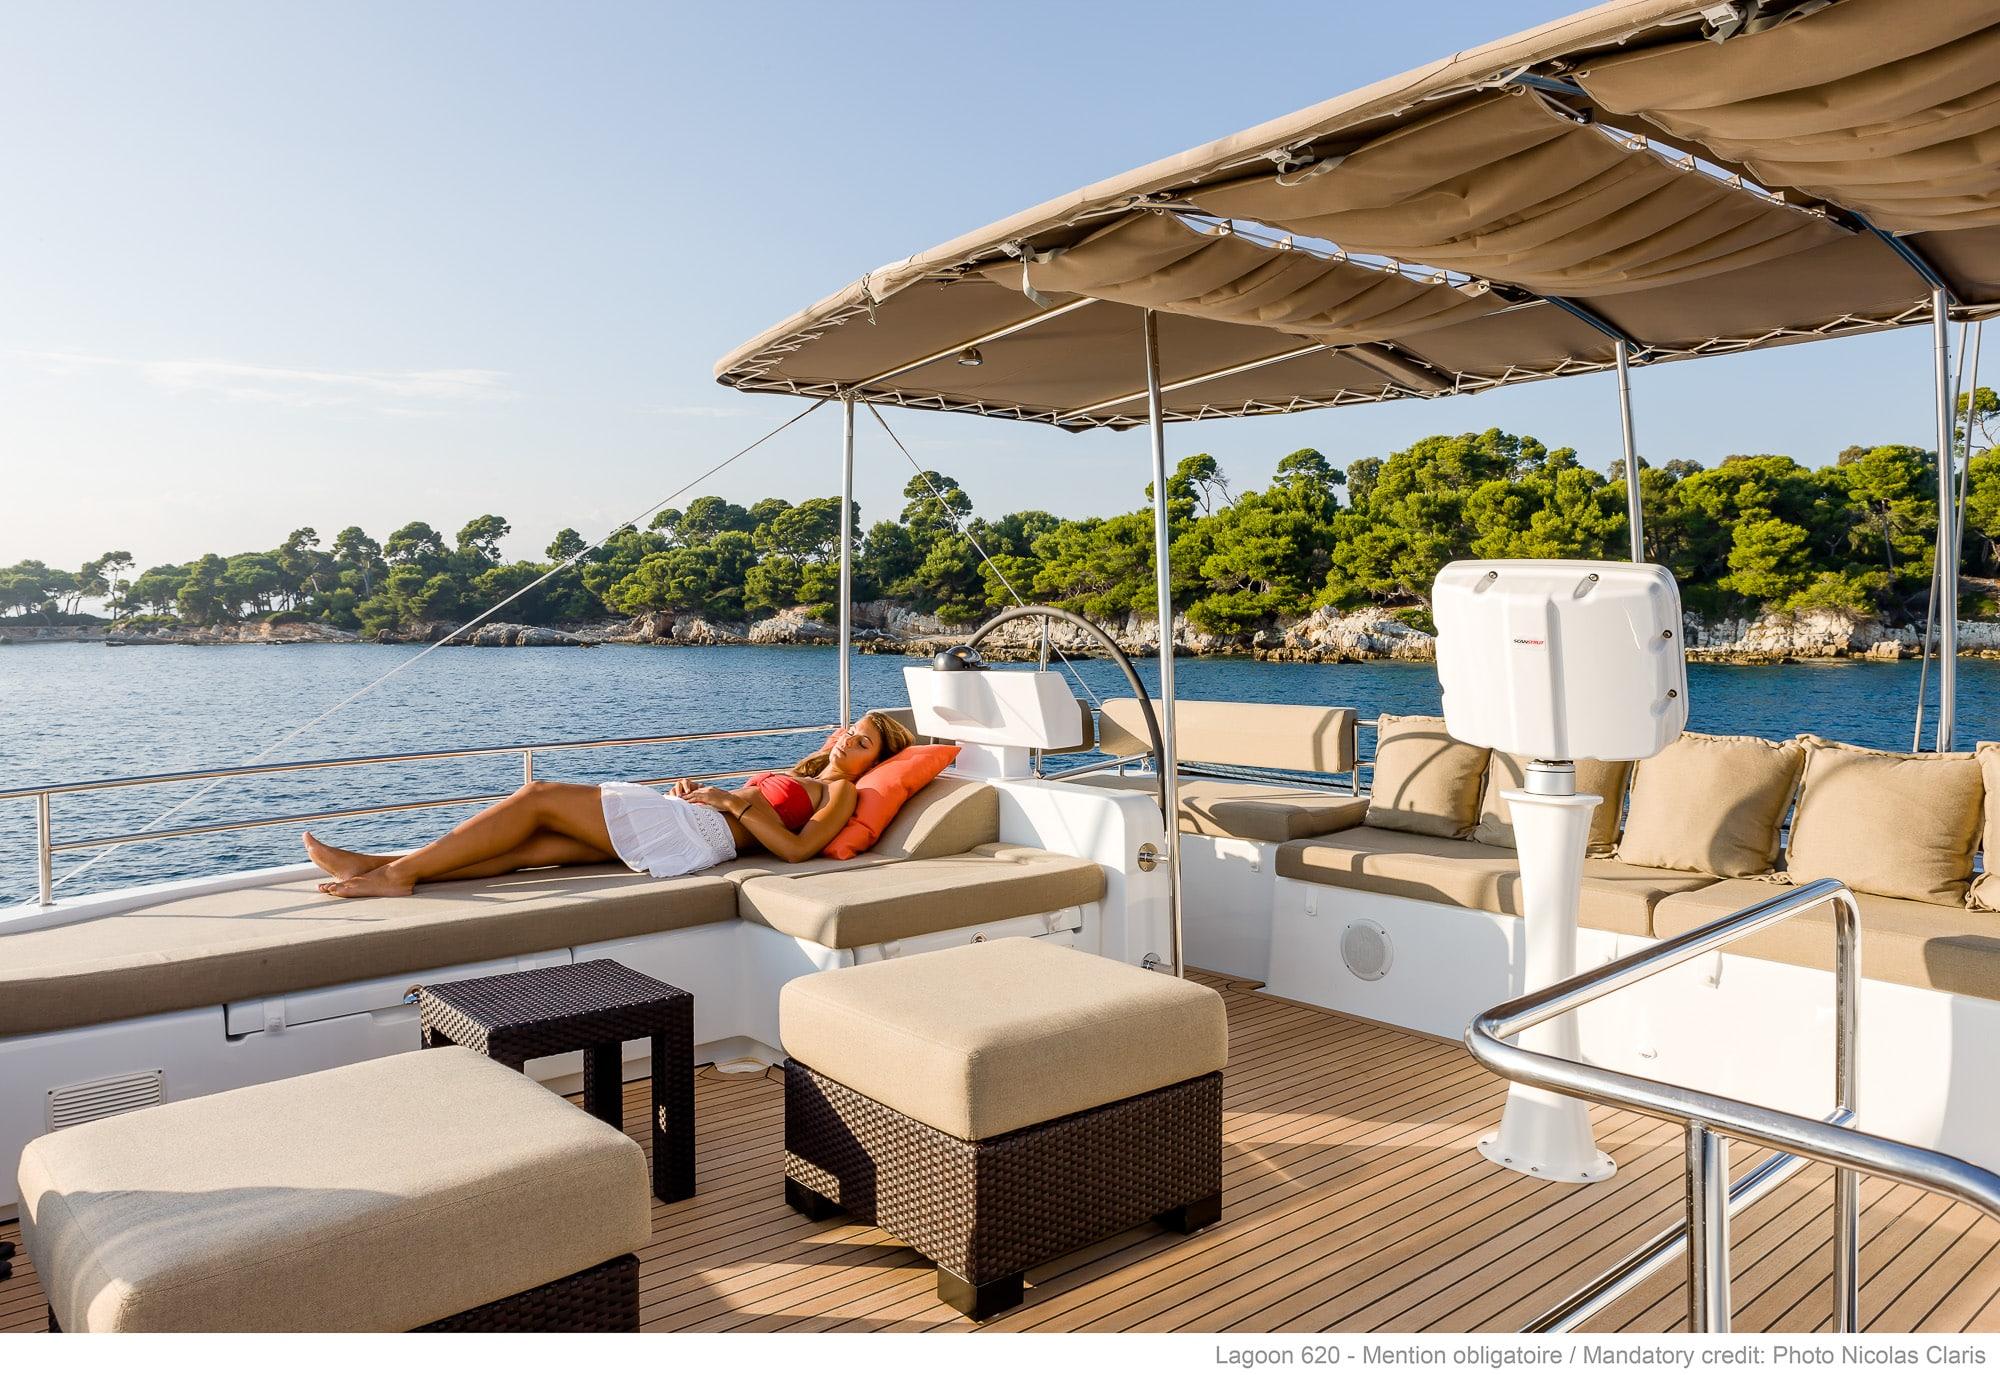 lagoon-620-yacht-charter-croatia-sailing-holidays-croatia-booking-yacht-charter-croatia-catamarans-sailboats-motorboats-gulets-luxury-yachts-boat-rental-croatia-21